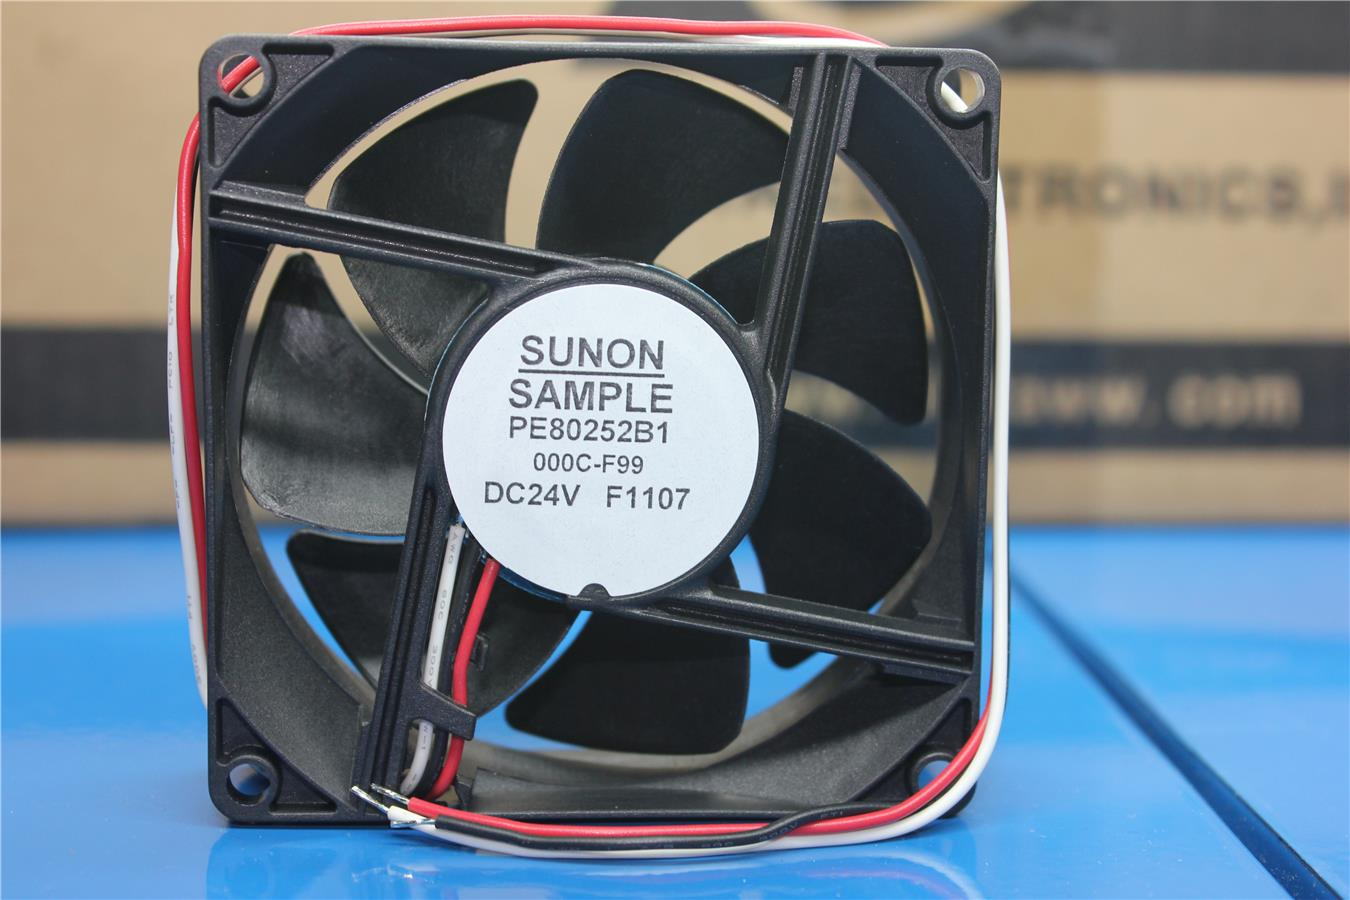 Sunon PE80252B1-000C-F99 8025 24V 4.8W inverter fan